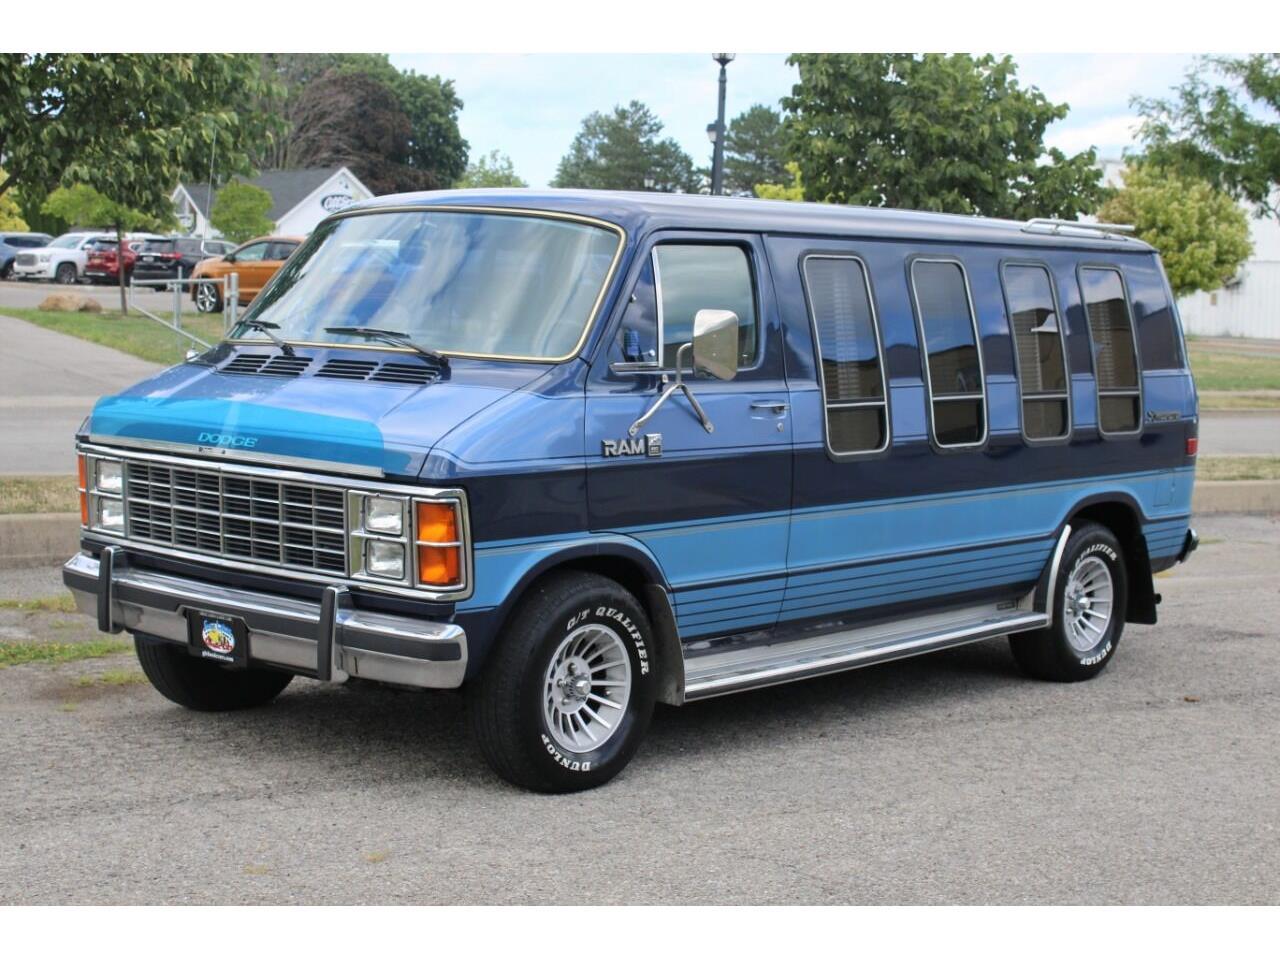 1984 Dodge Ram Van For Sale Classiccars Com Cc 1381483